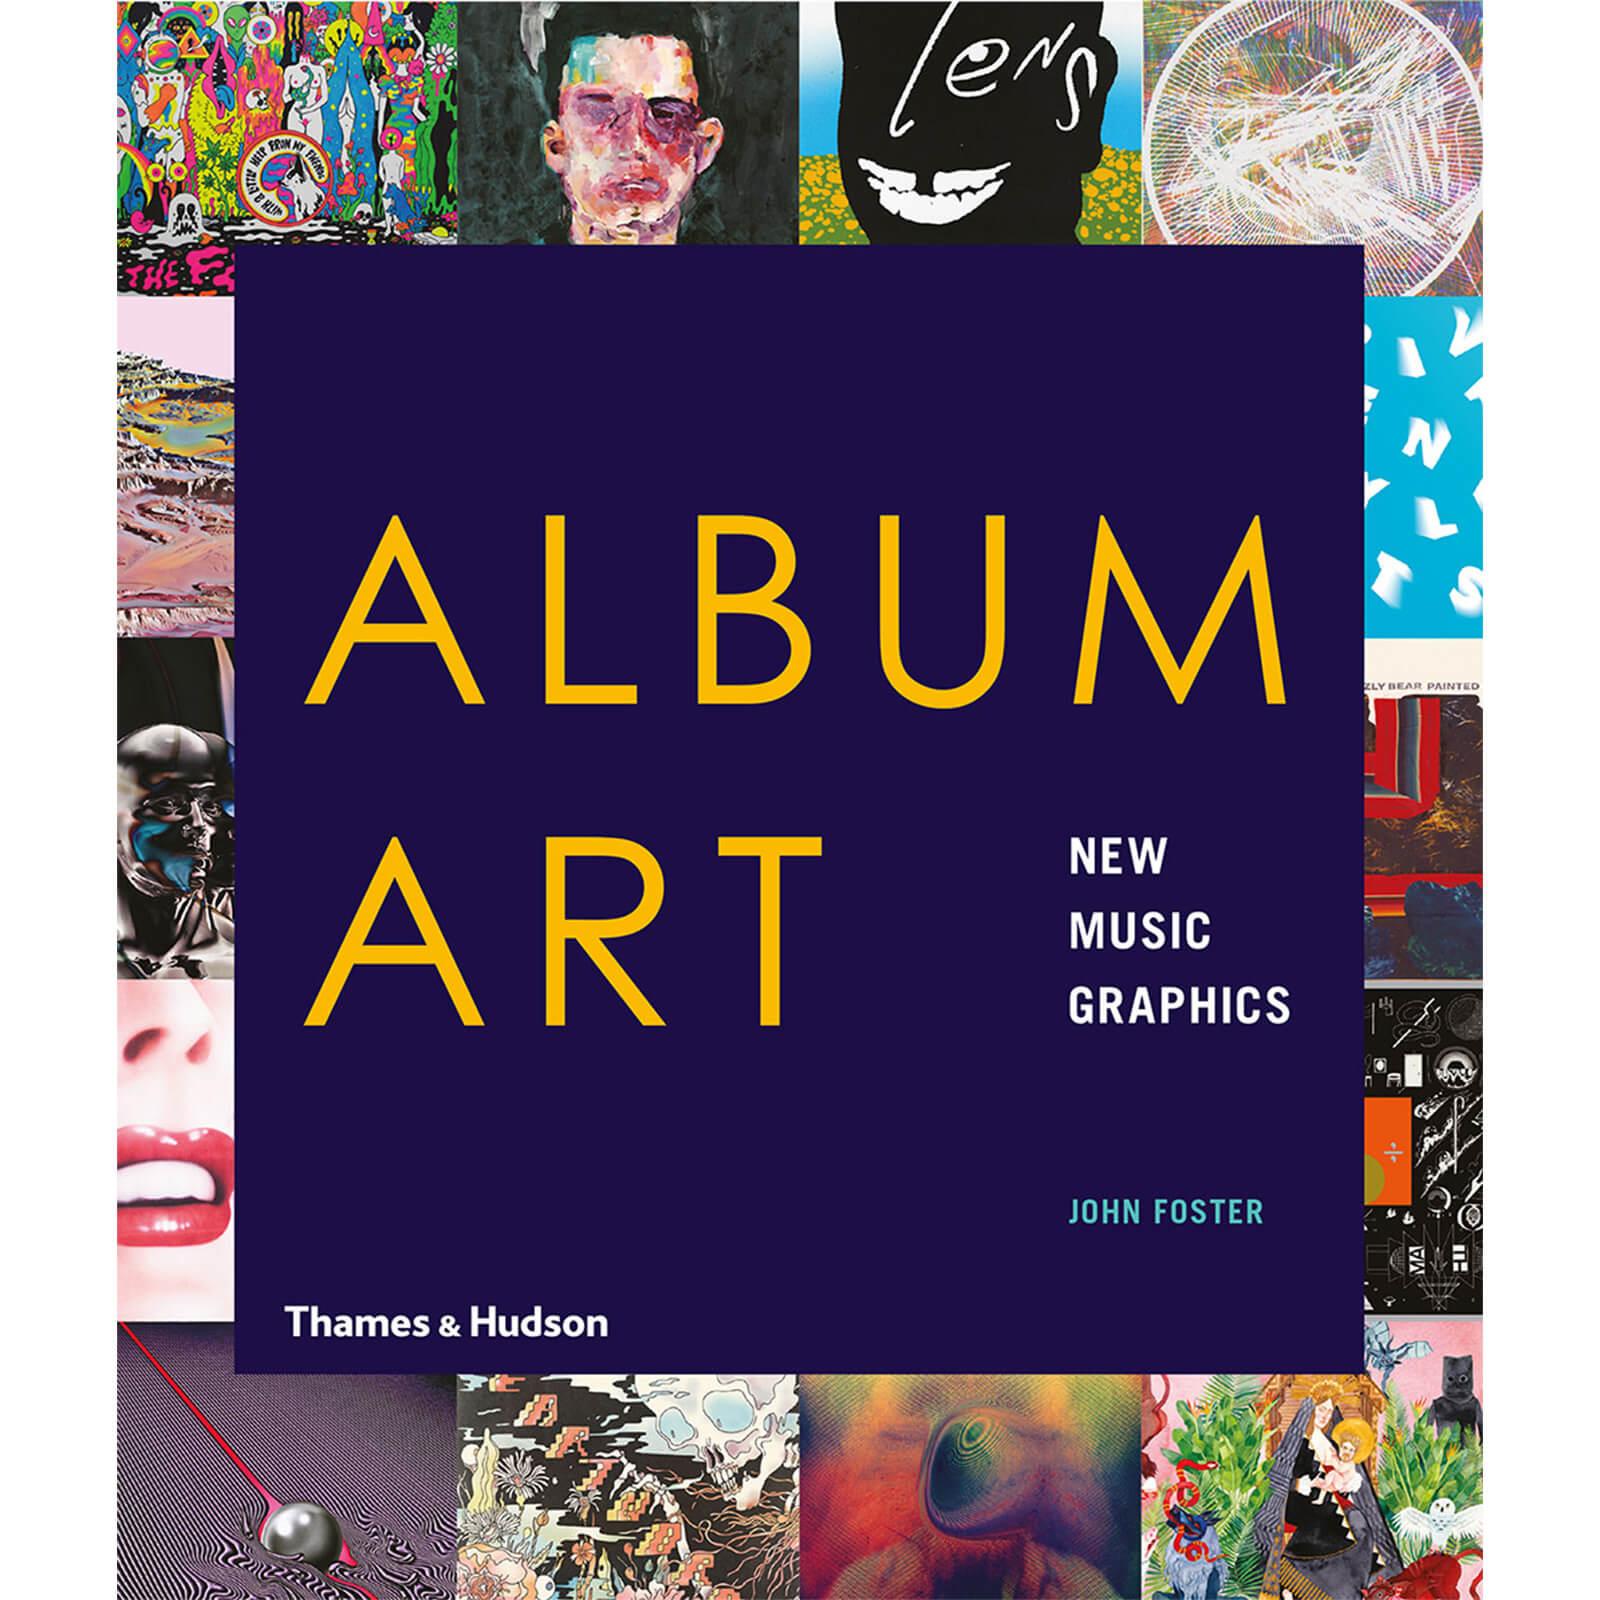 Thames and Hudson Ltd: Album Art New Music Graphics